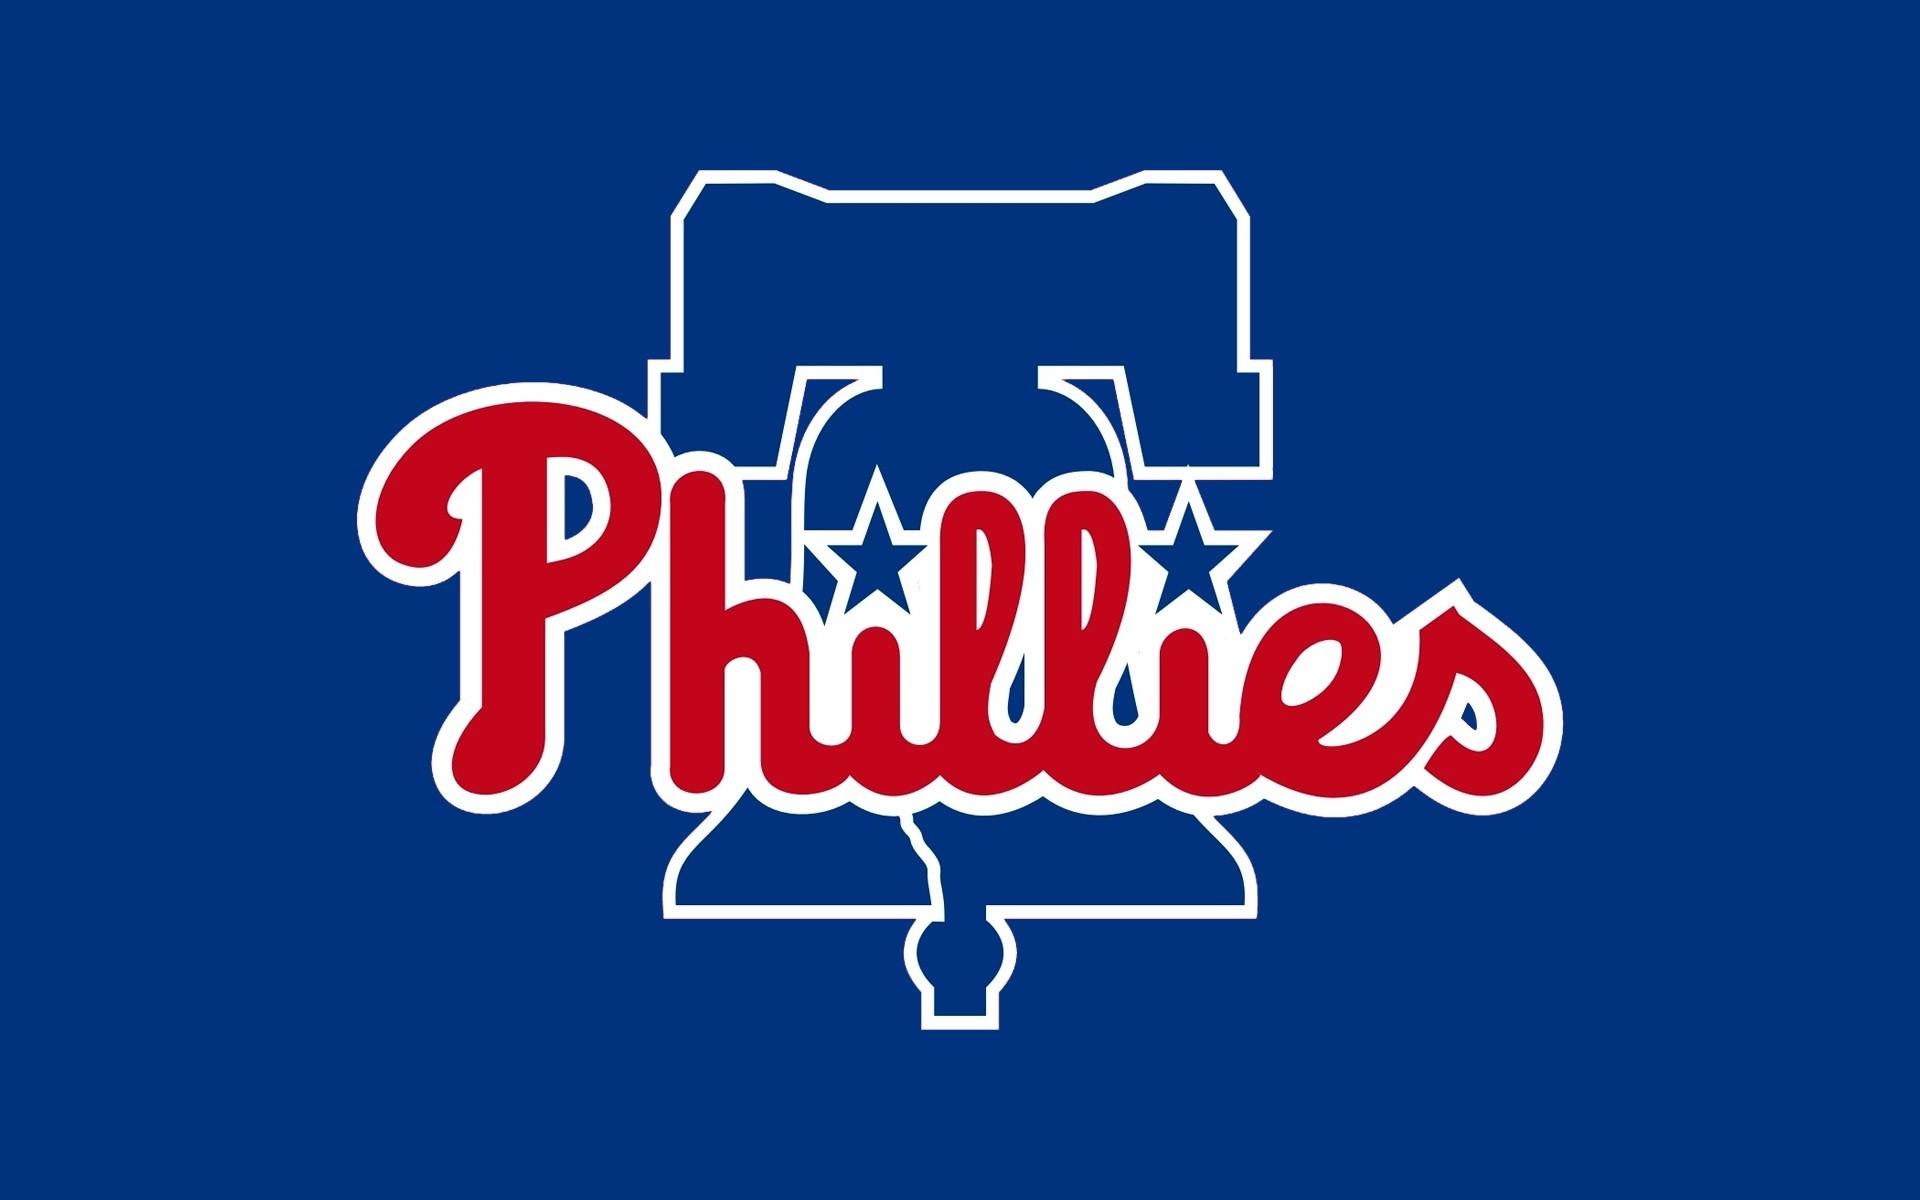 Philadelphia Phillies Wallpaper